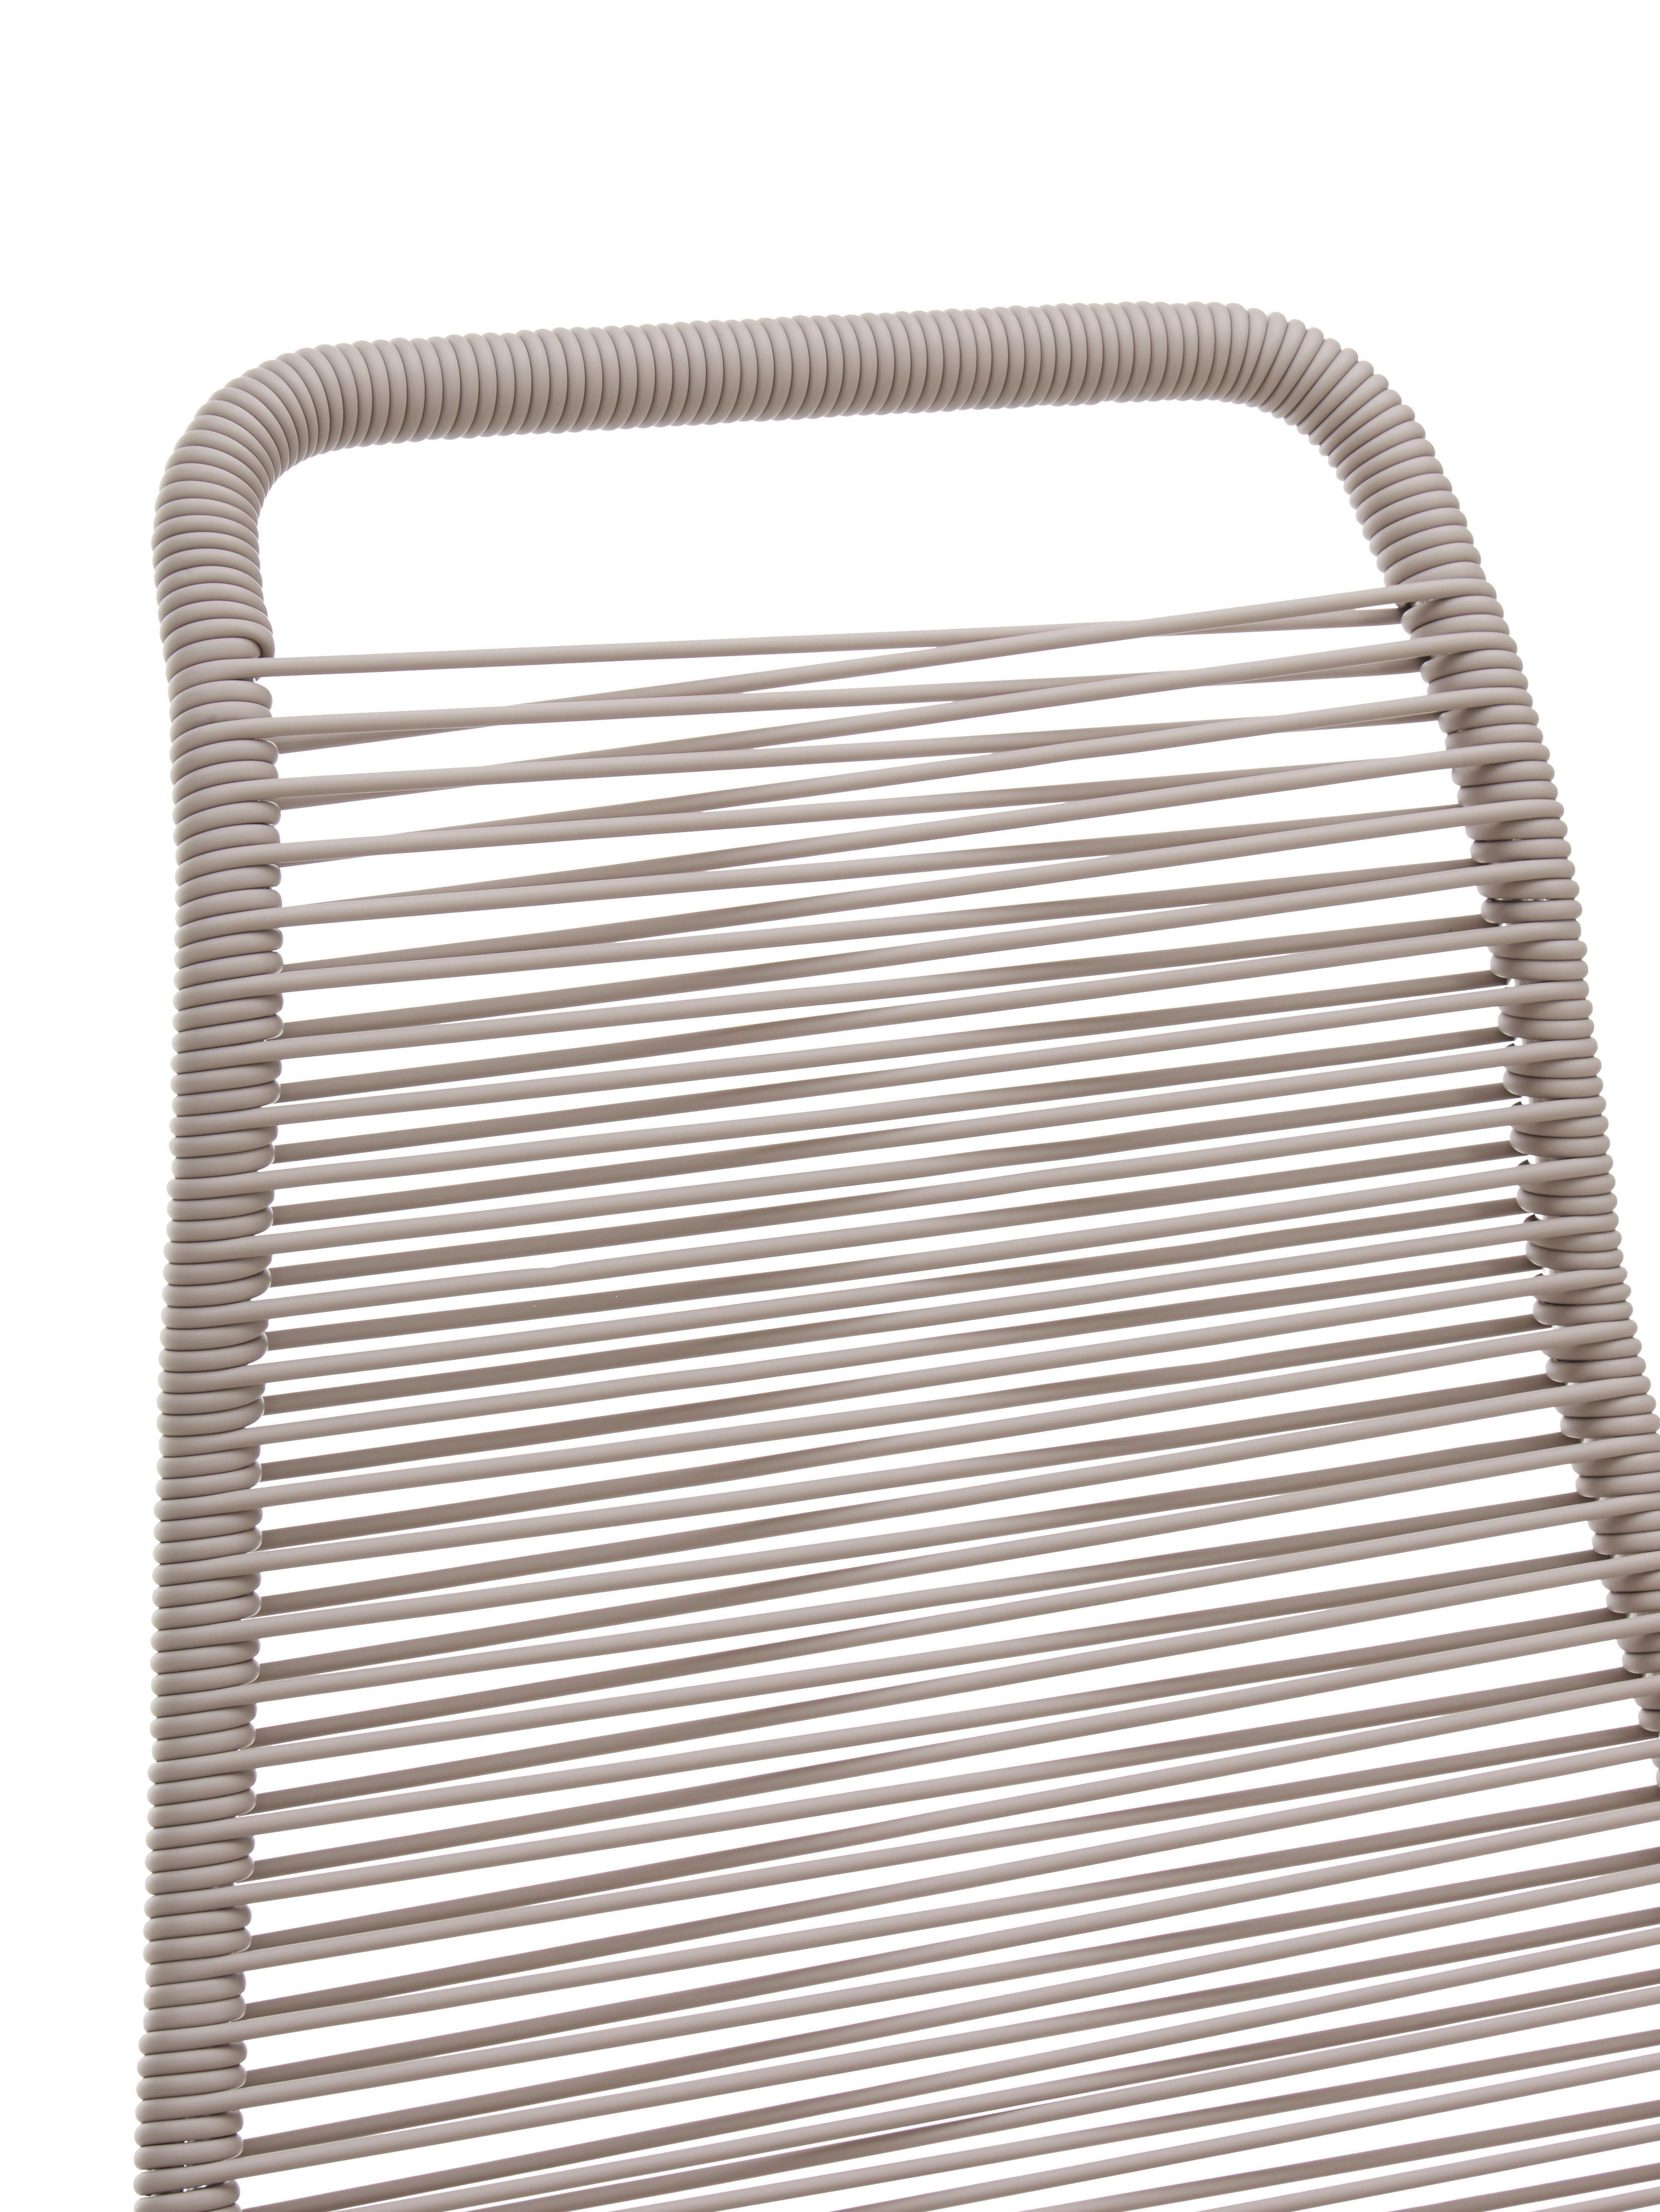 Garten-Liegestuhl Spaghetti mit Fußstütze, Gestell: Aluminium, Taupe, B 60 x T 48 cm